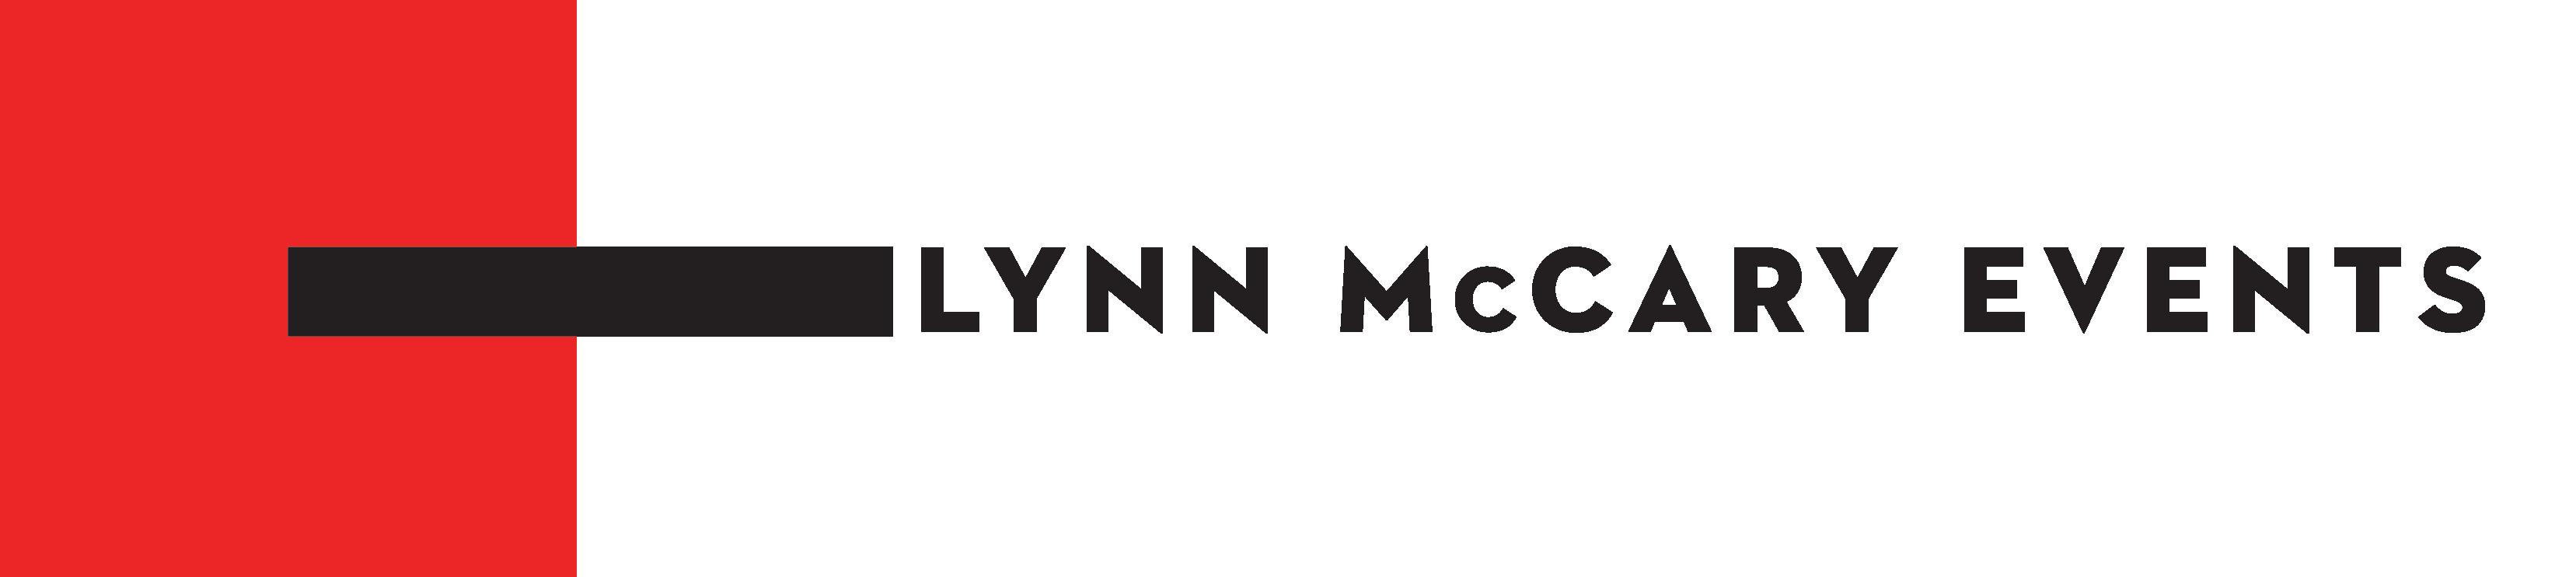 Lynn McCary Events